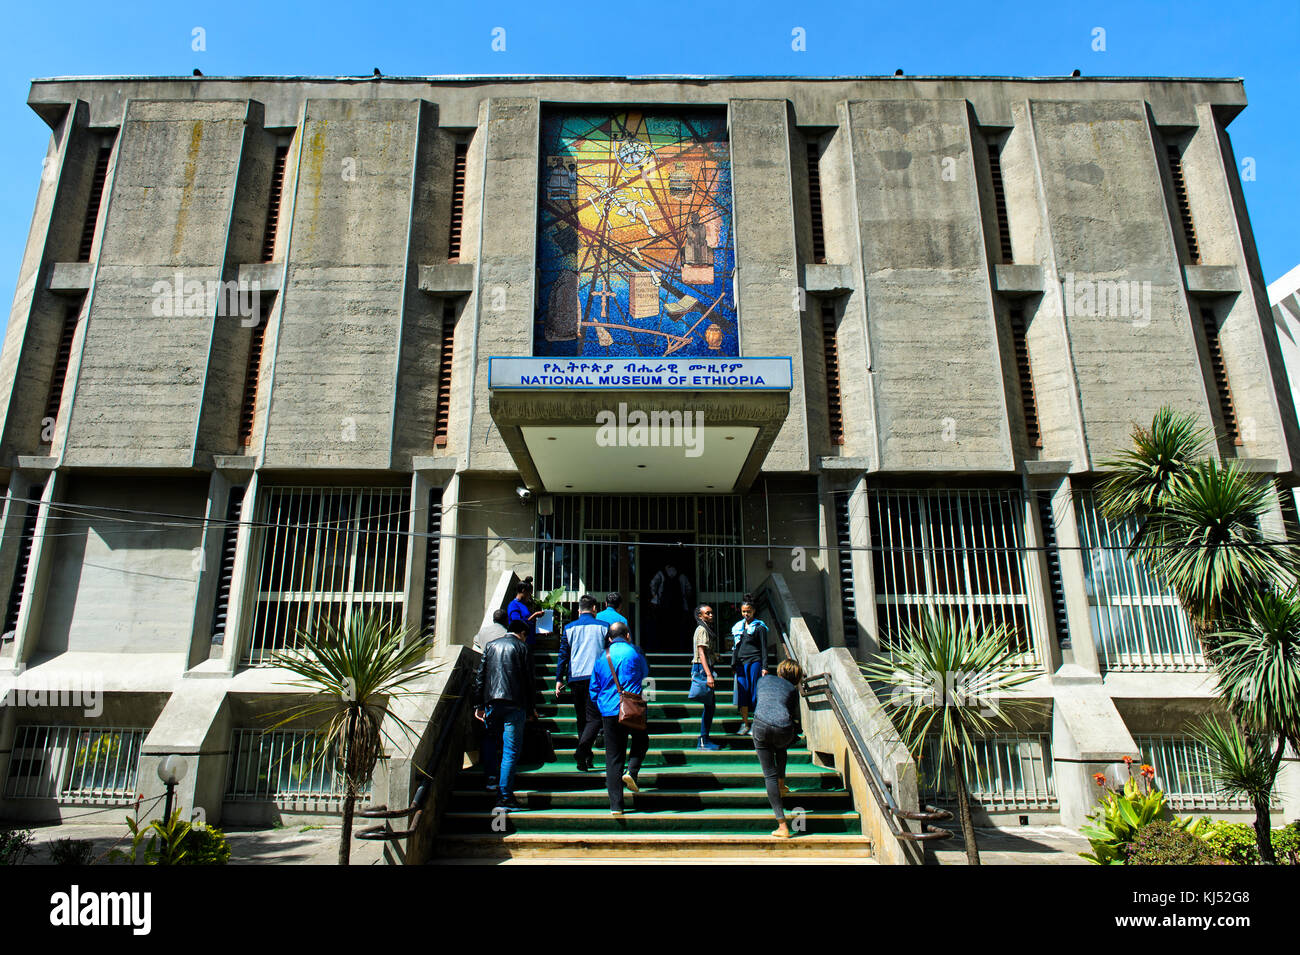 Entrance to the National Museum of Ethiopia, Addis Ababa, Ethiopia - Stock Image